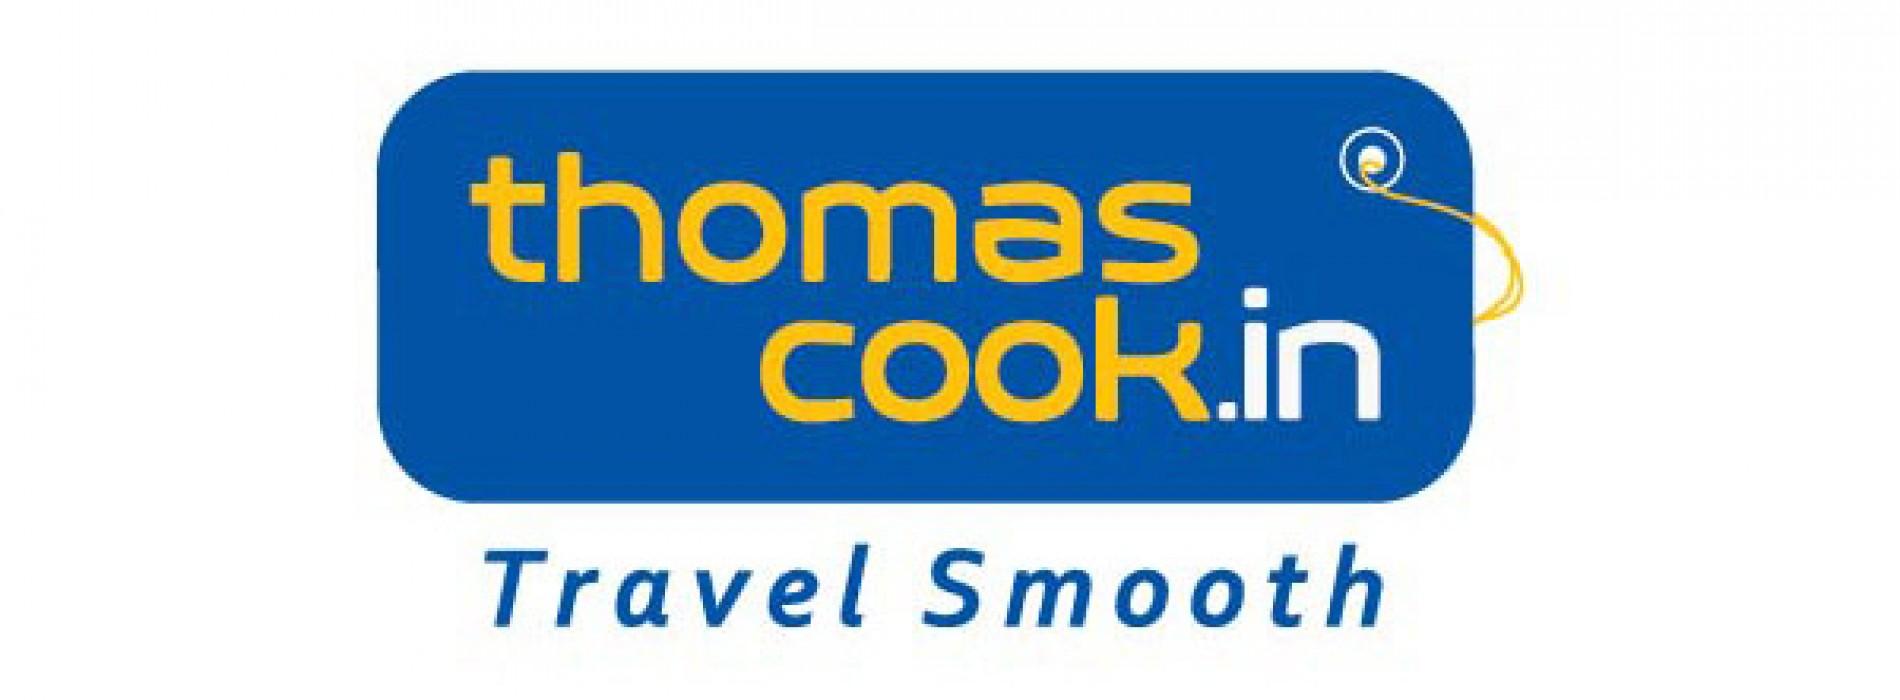 Thomas Cook India inks long term strategic partnership with Seoul Tourism